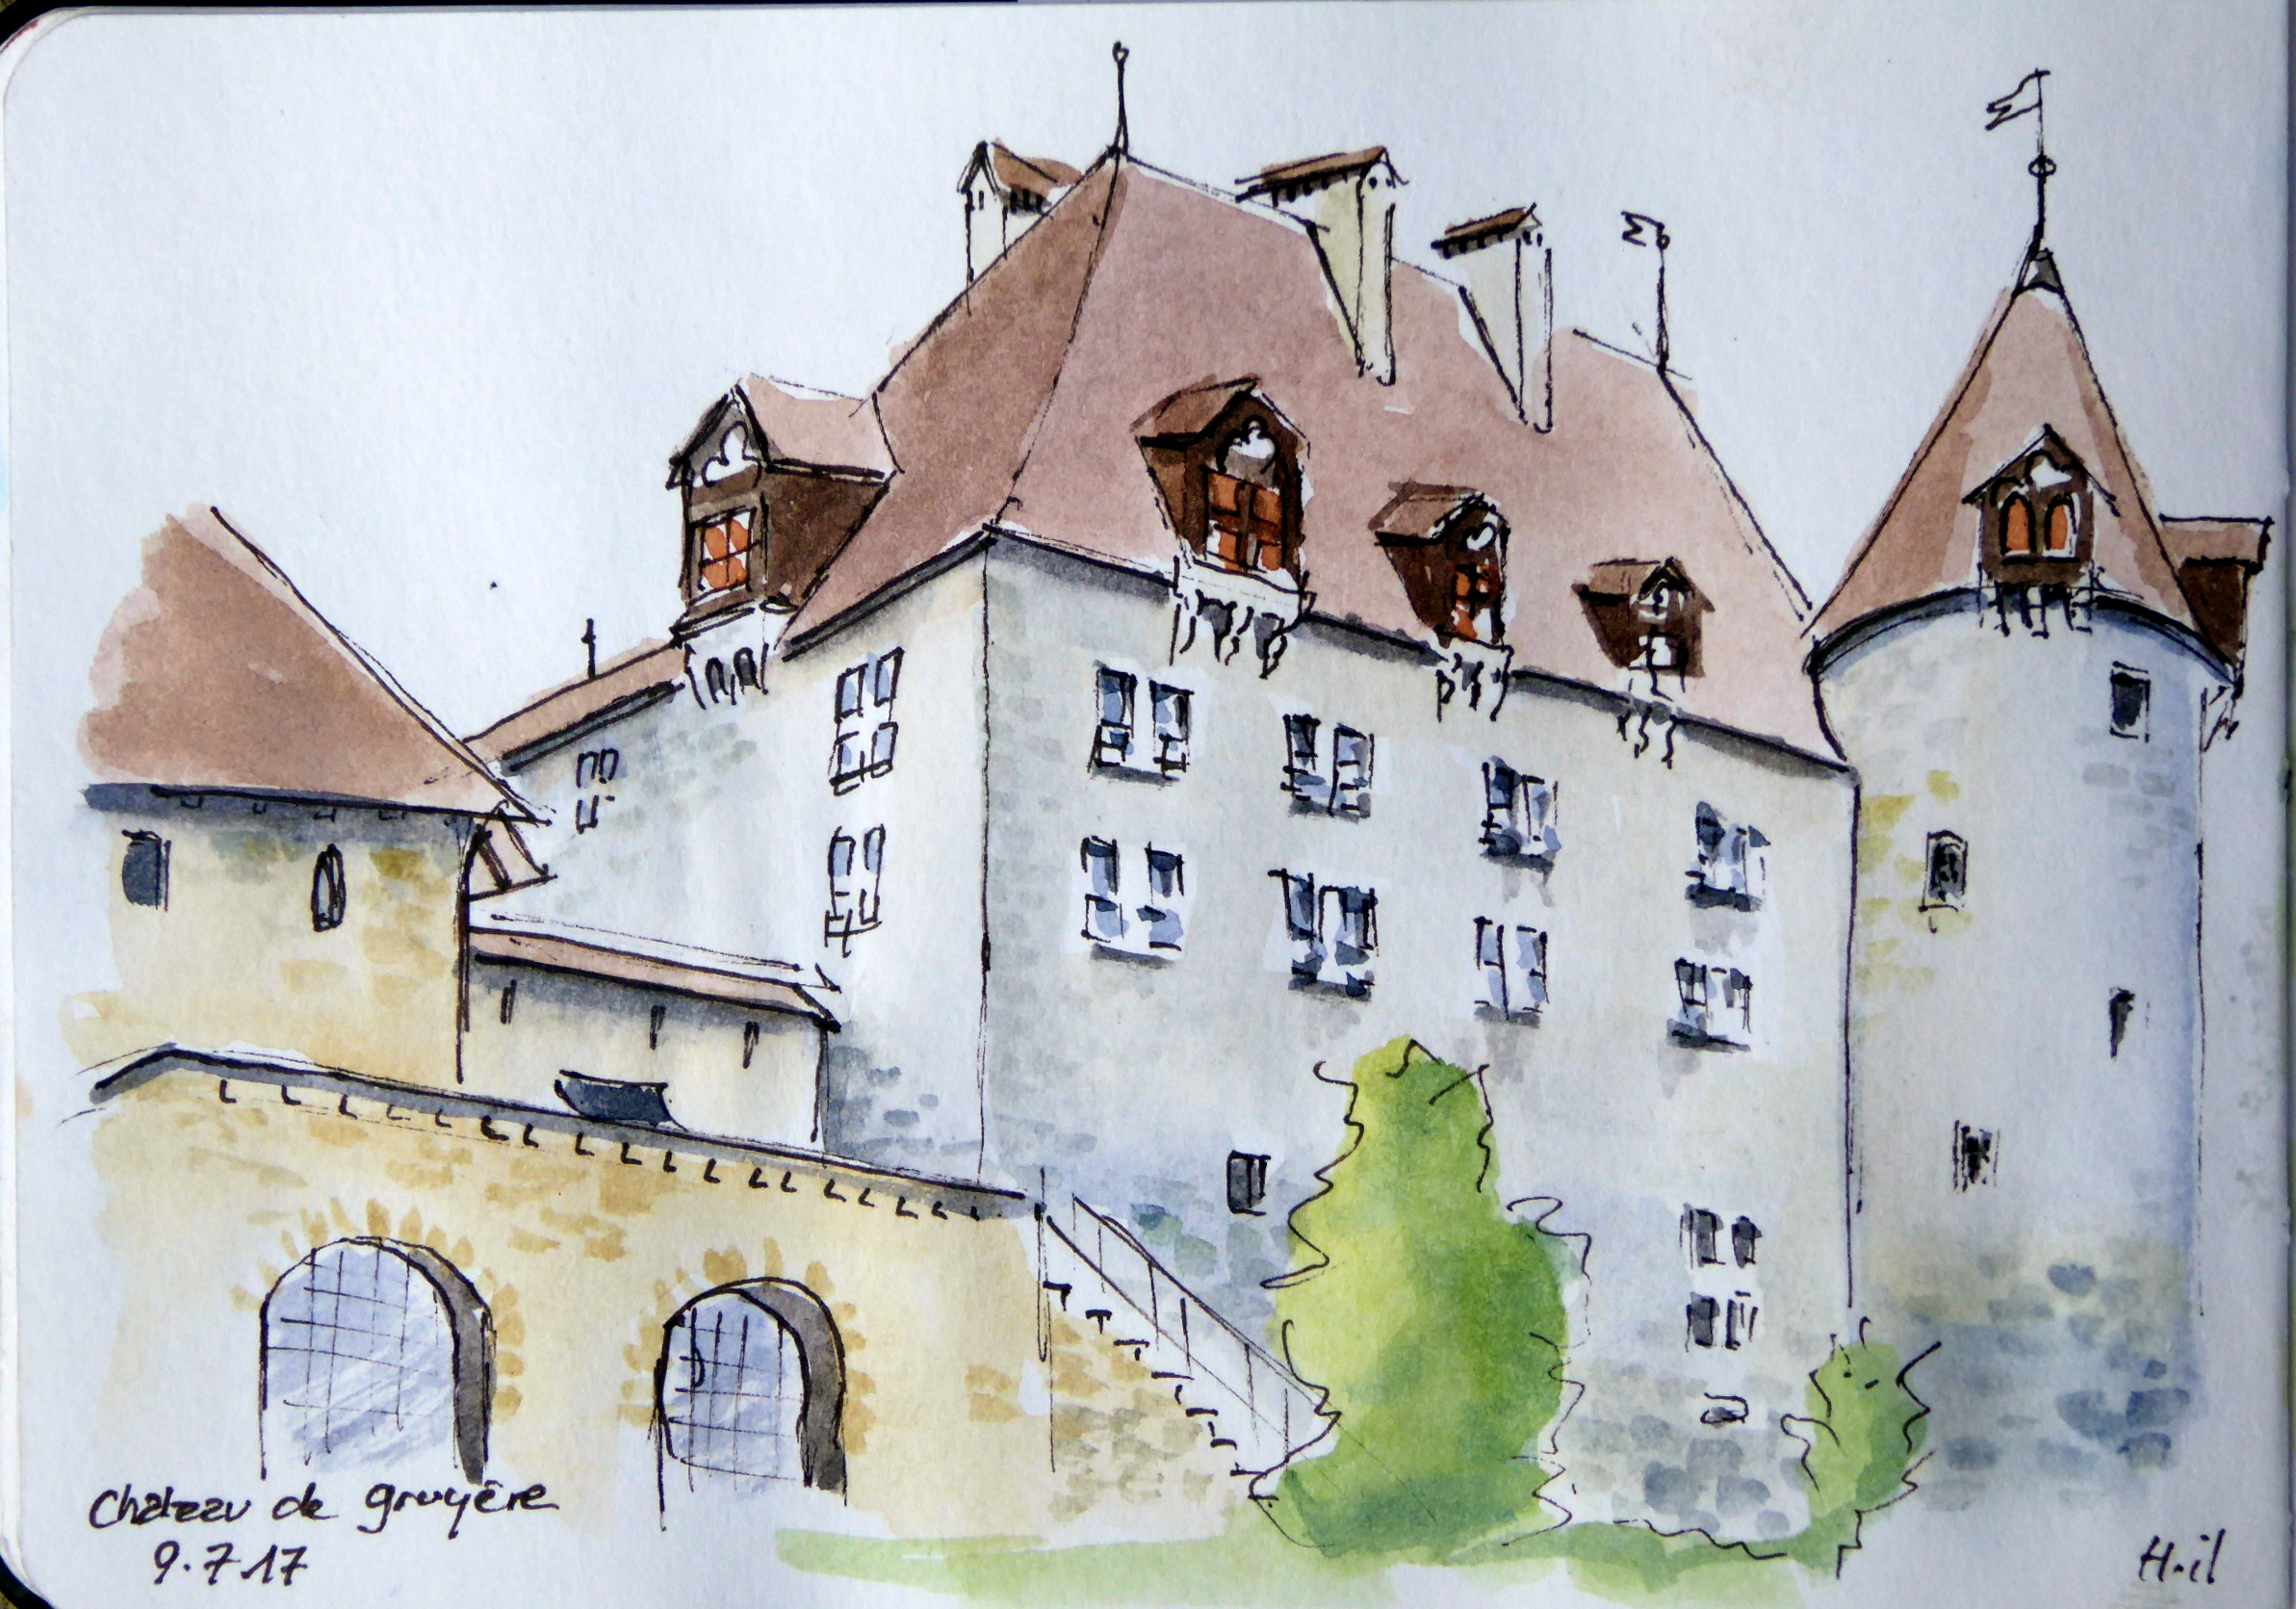 Chateau_gruyère